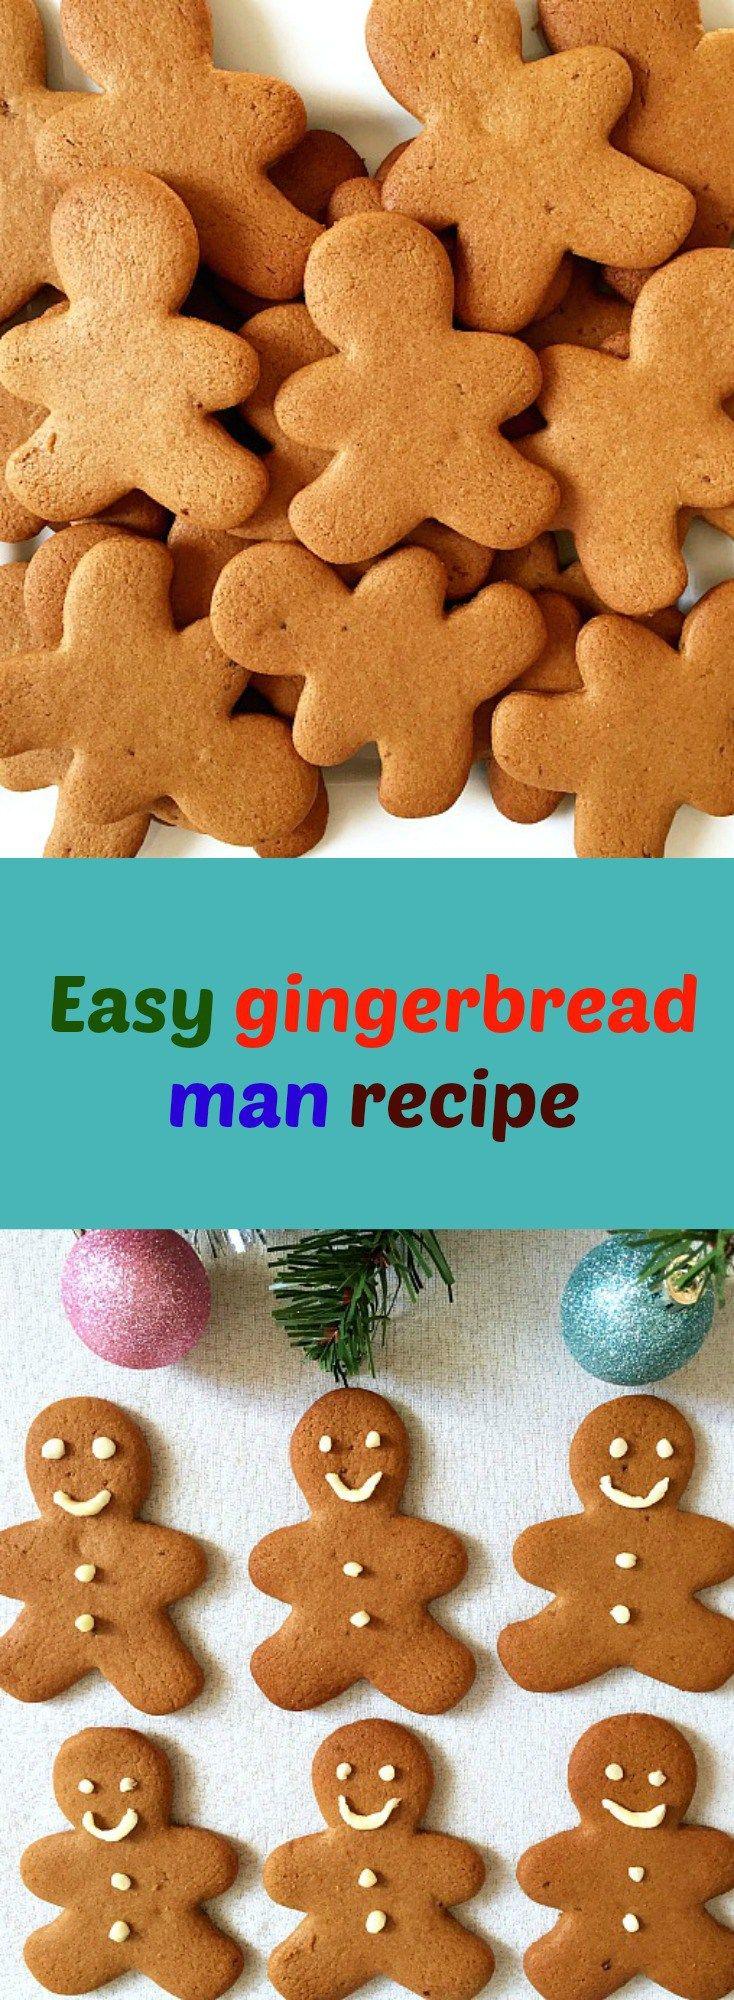 Easy gingerbread man recipe, a fun way to get Christmas